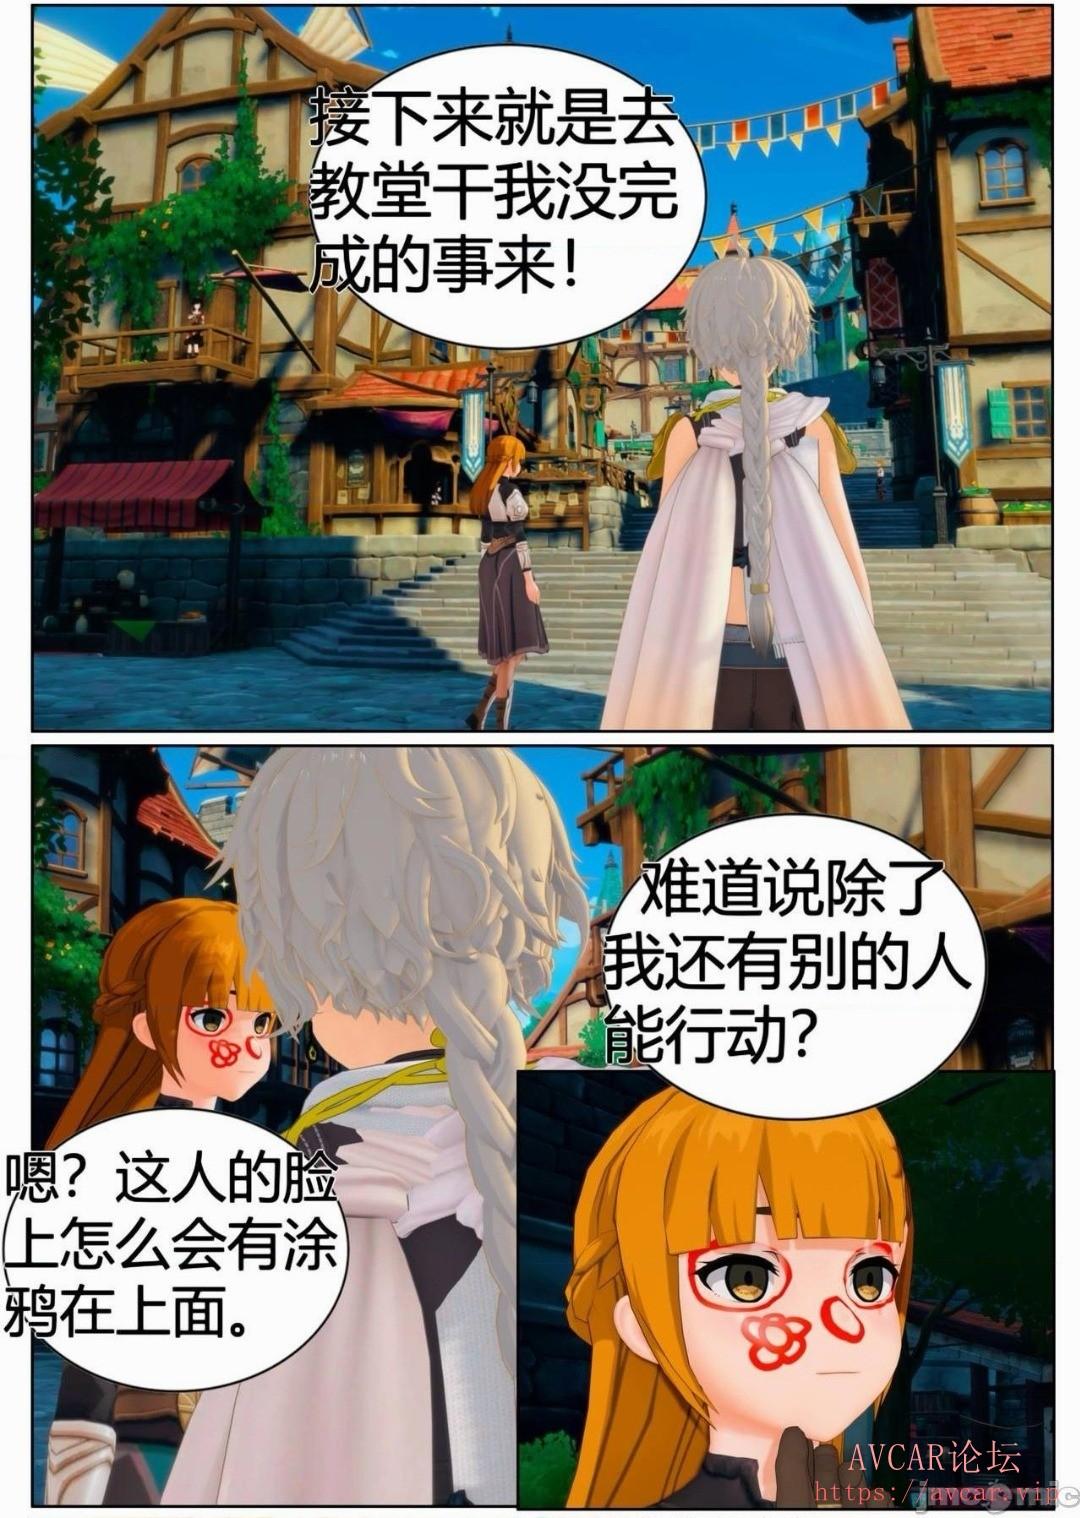 Screenshot_20210914_035551_com.new_comic18_edit_9160593067872.jpg